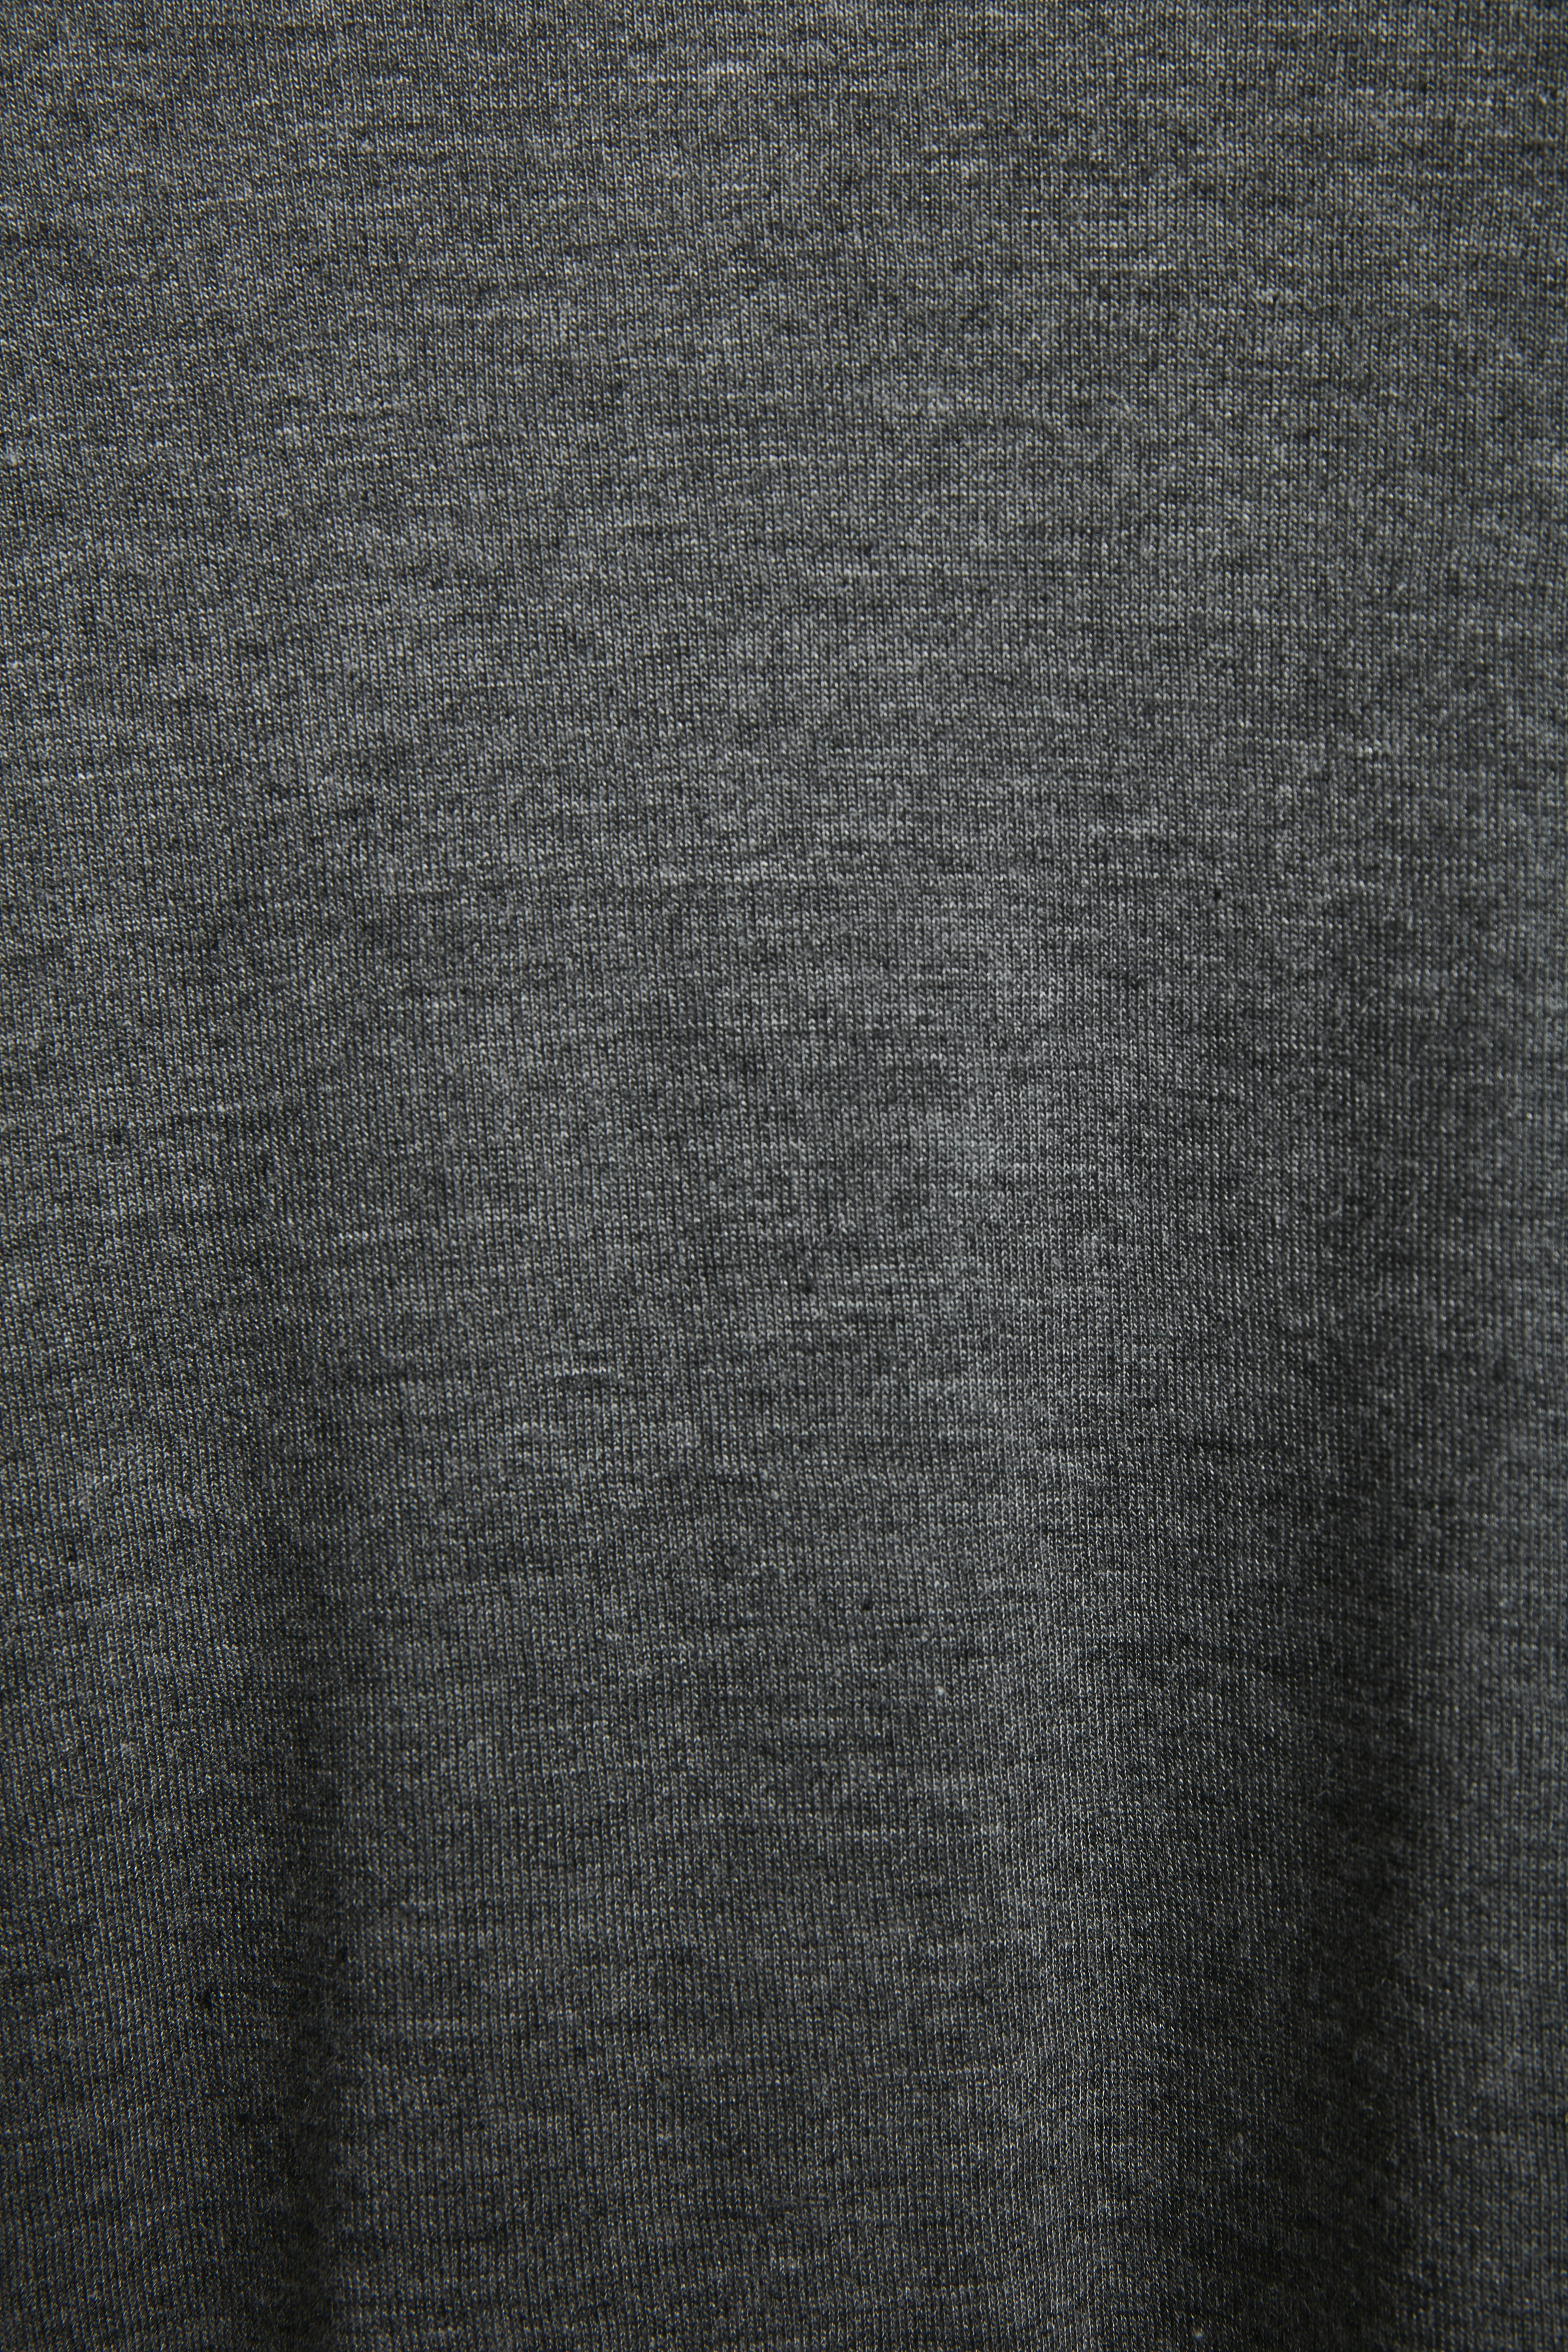 Mørk gråmeleret Kortærmet T-shirt fra Kaffe – Køb Mørk gråmeleret Kortærmet T-shirt fra str. XS-XXL her